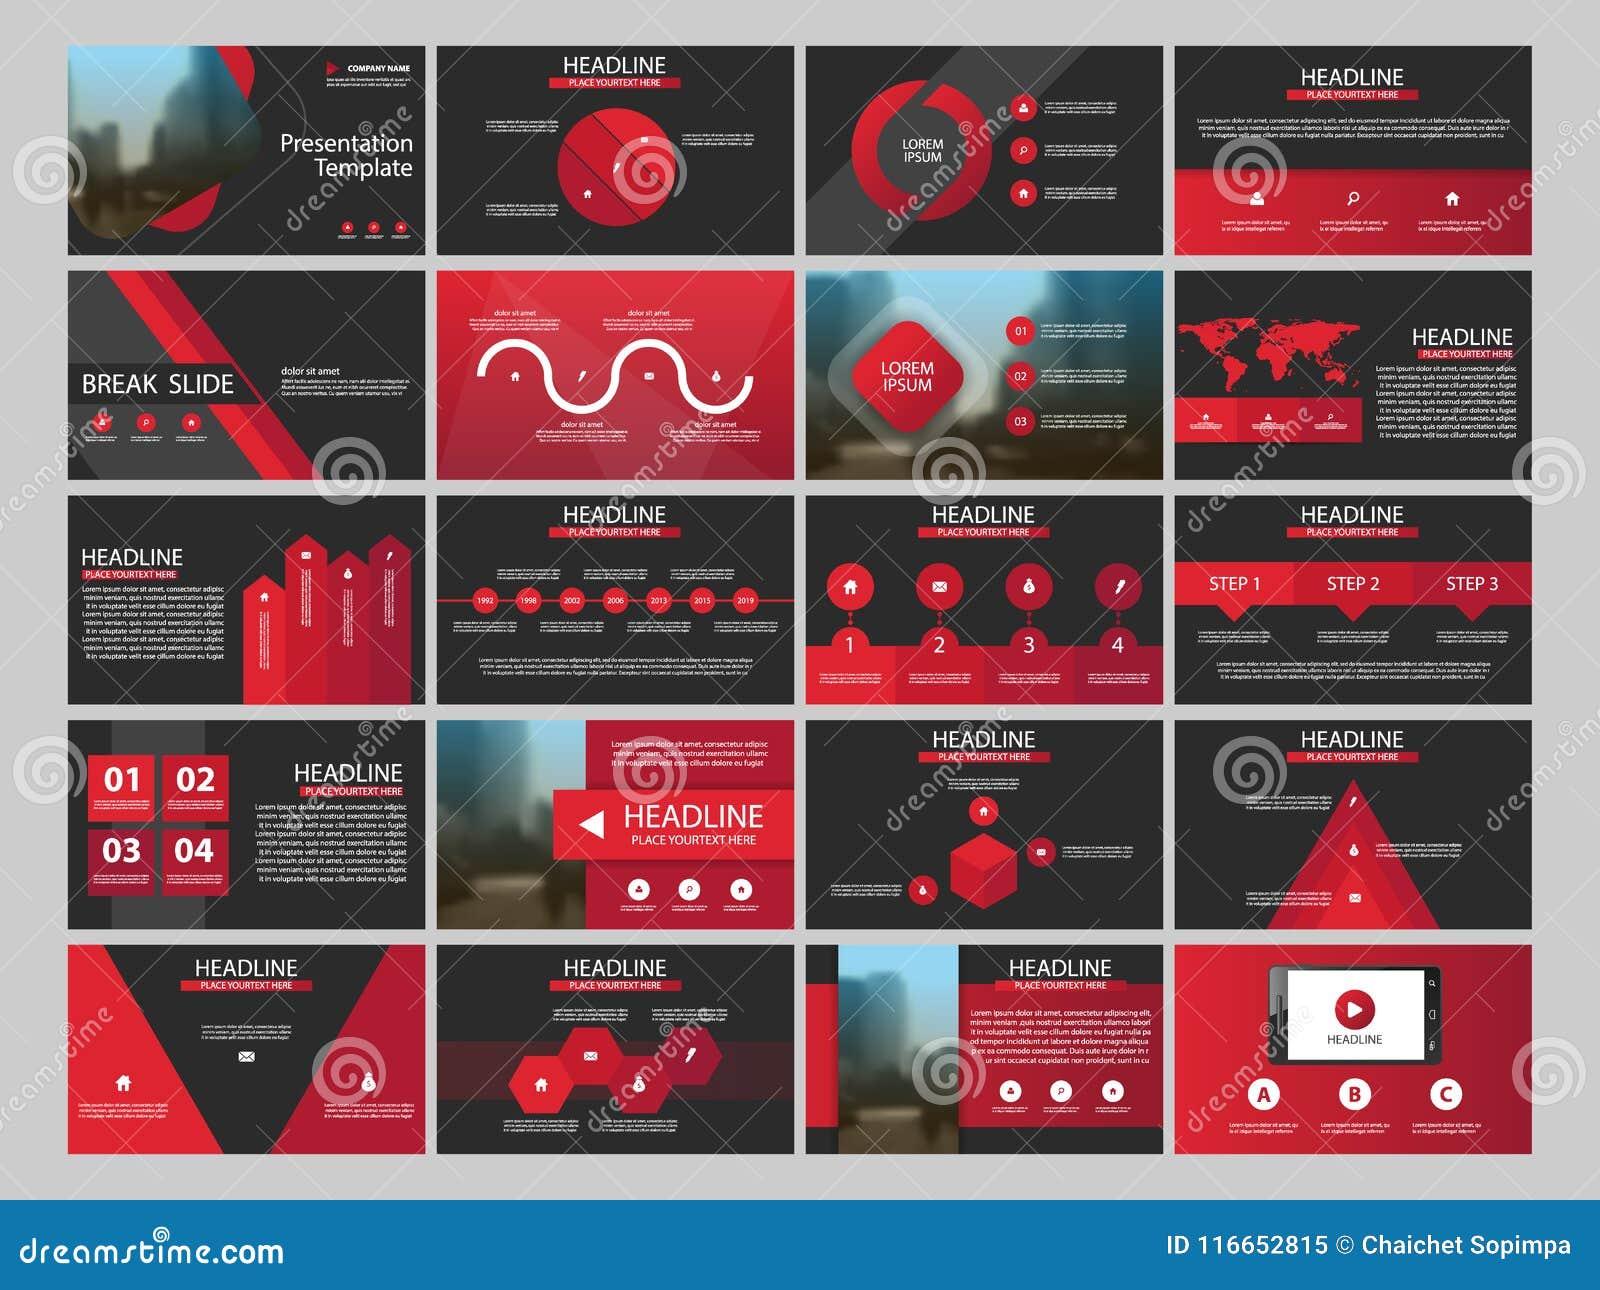 20 infographic πρότυπο παρουσίασης στοιχείων δεσμών επιχειρησιακή ετήσια έκθεση, φυλλάδιο, φυλλάδιο, ιπτάμενο διαφήμισης,